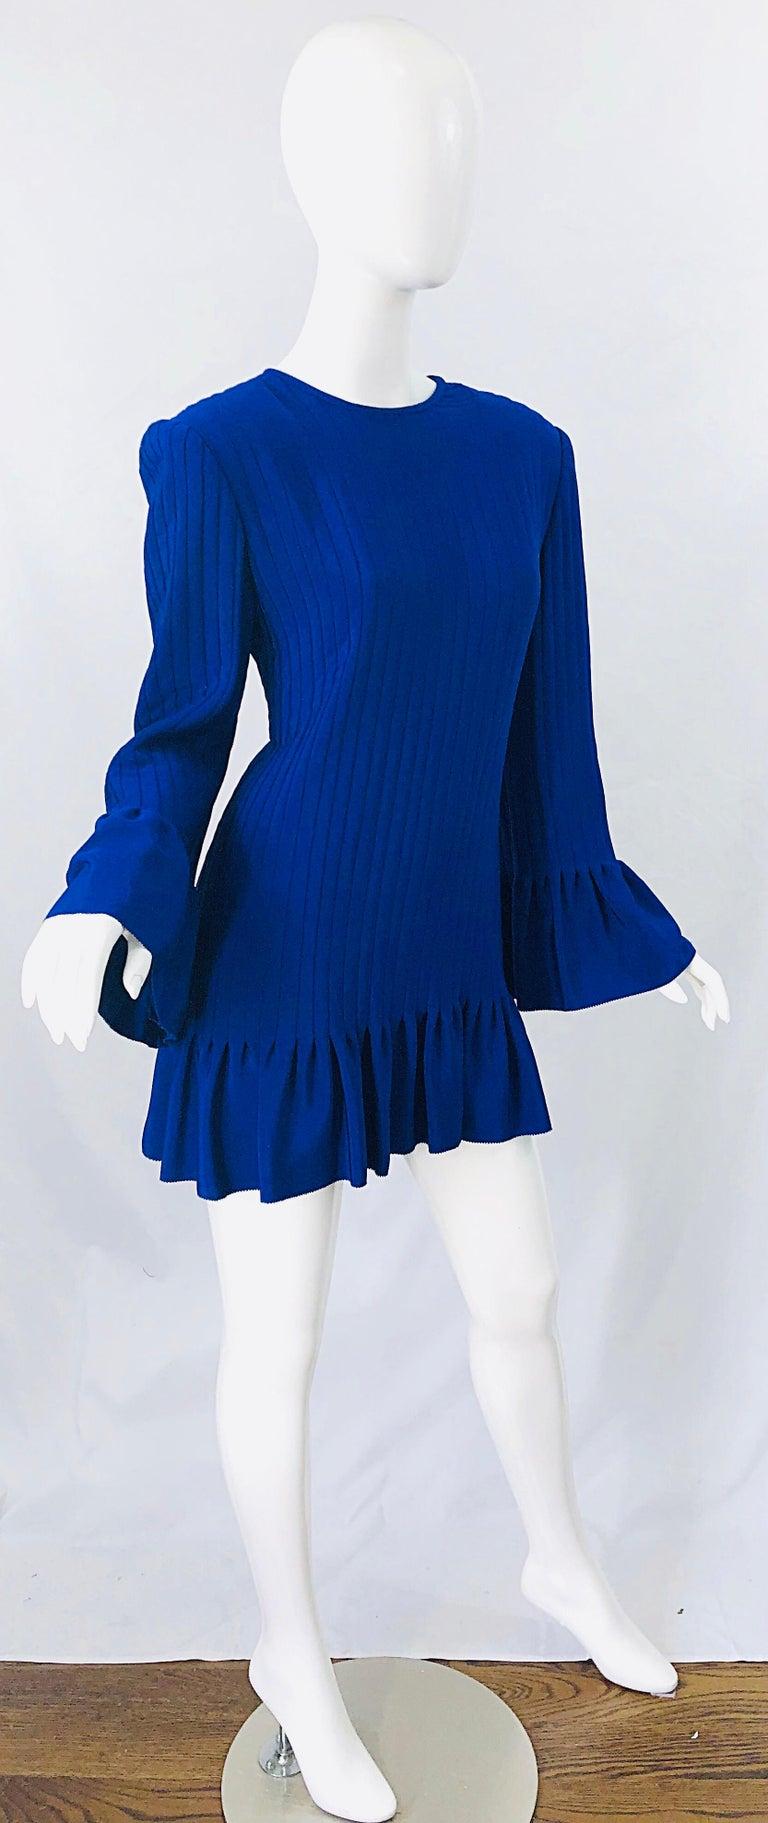 Vintage Tarquin Ebker Royal Blue 1980s Silk Pleated 80s Mini Dress Tunic Shirt For Sale 9